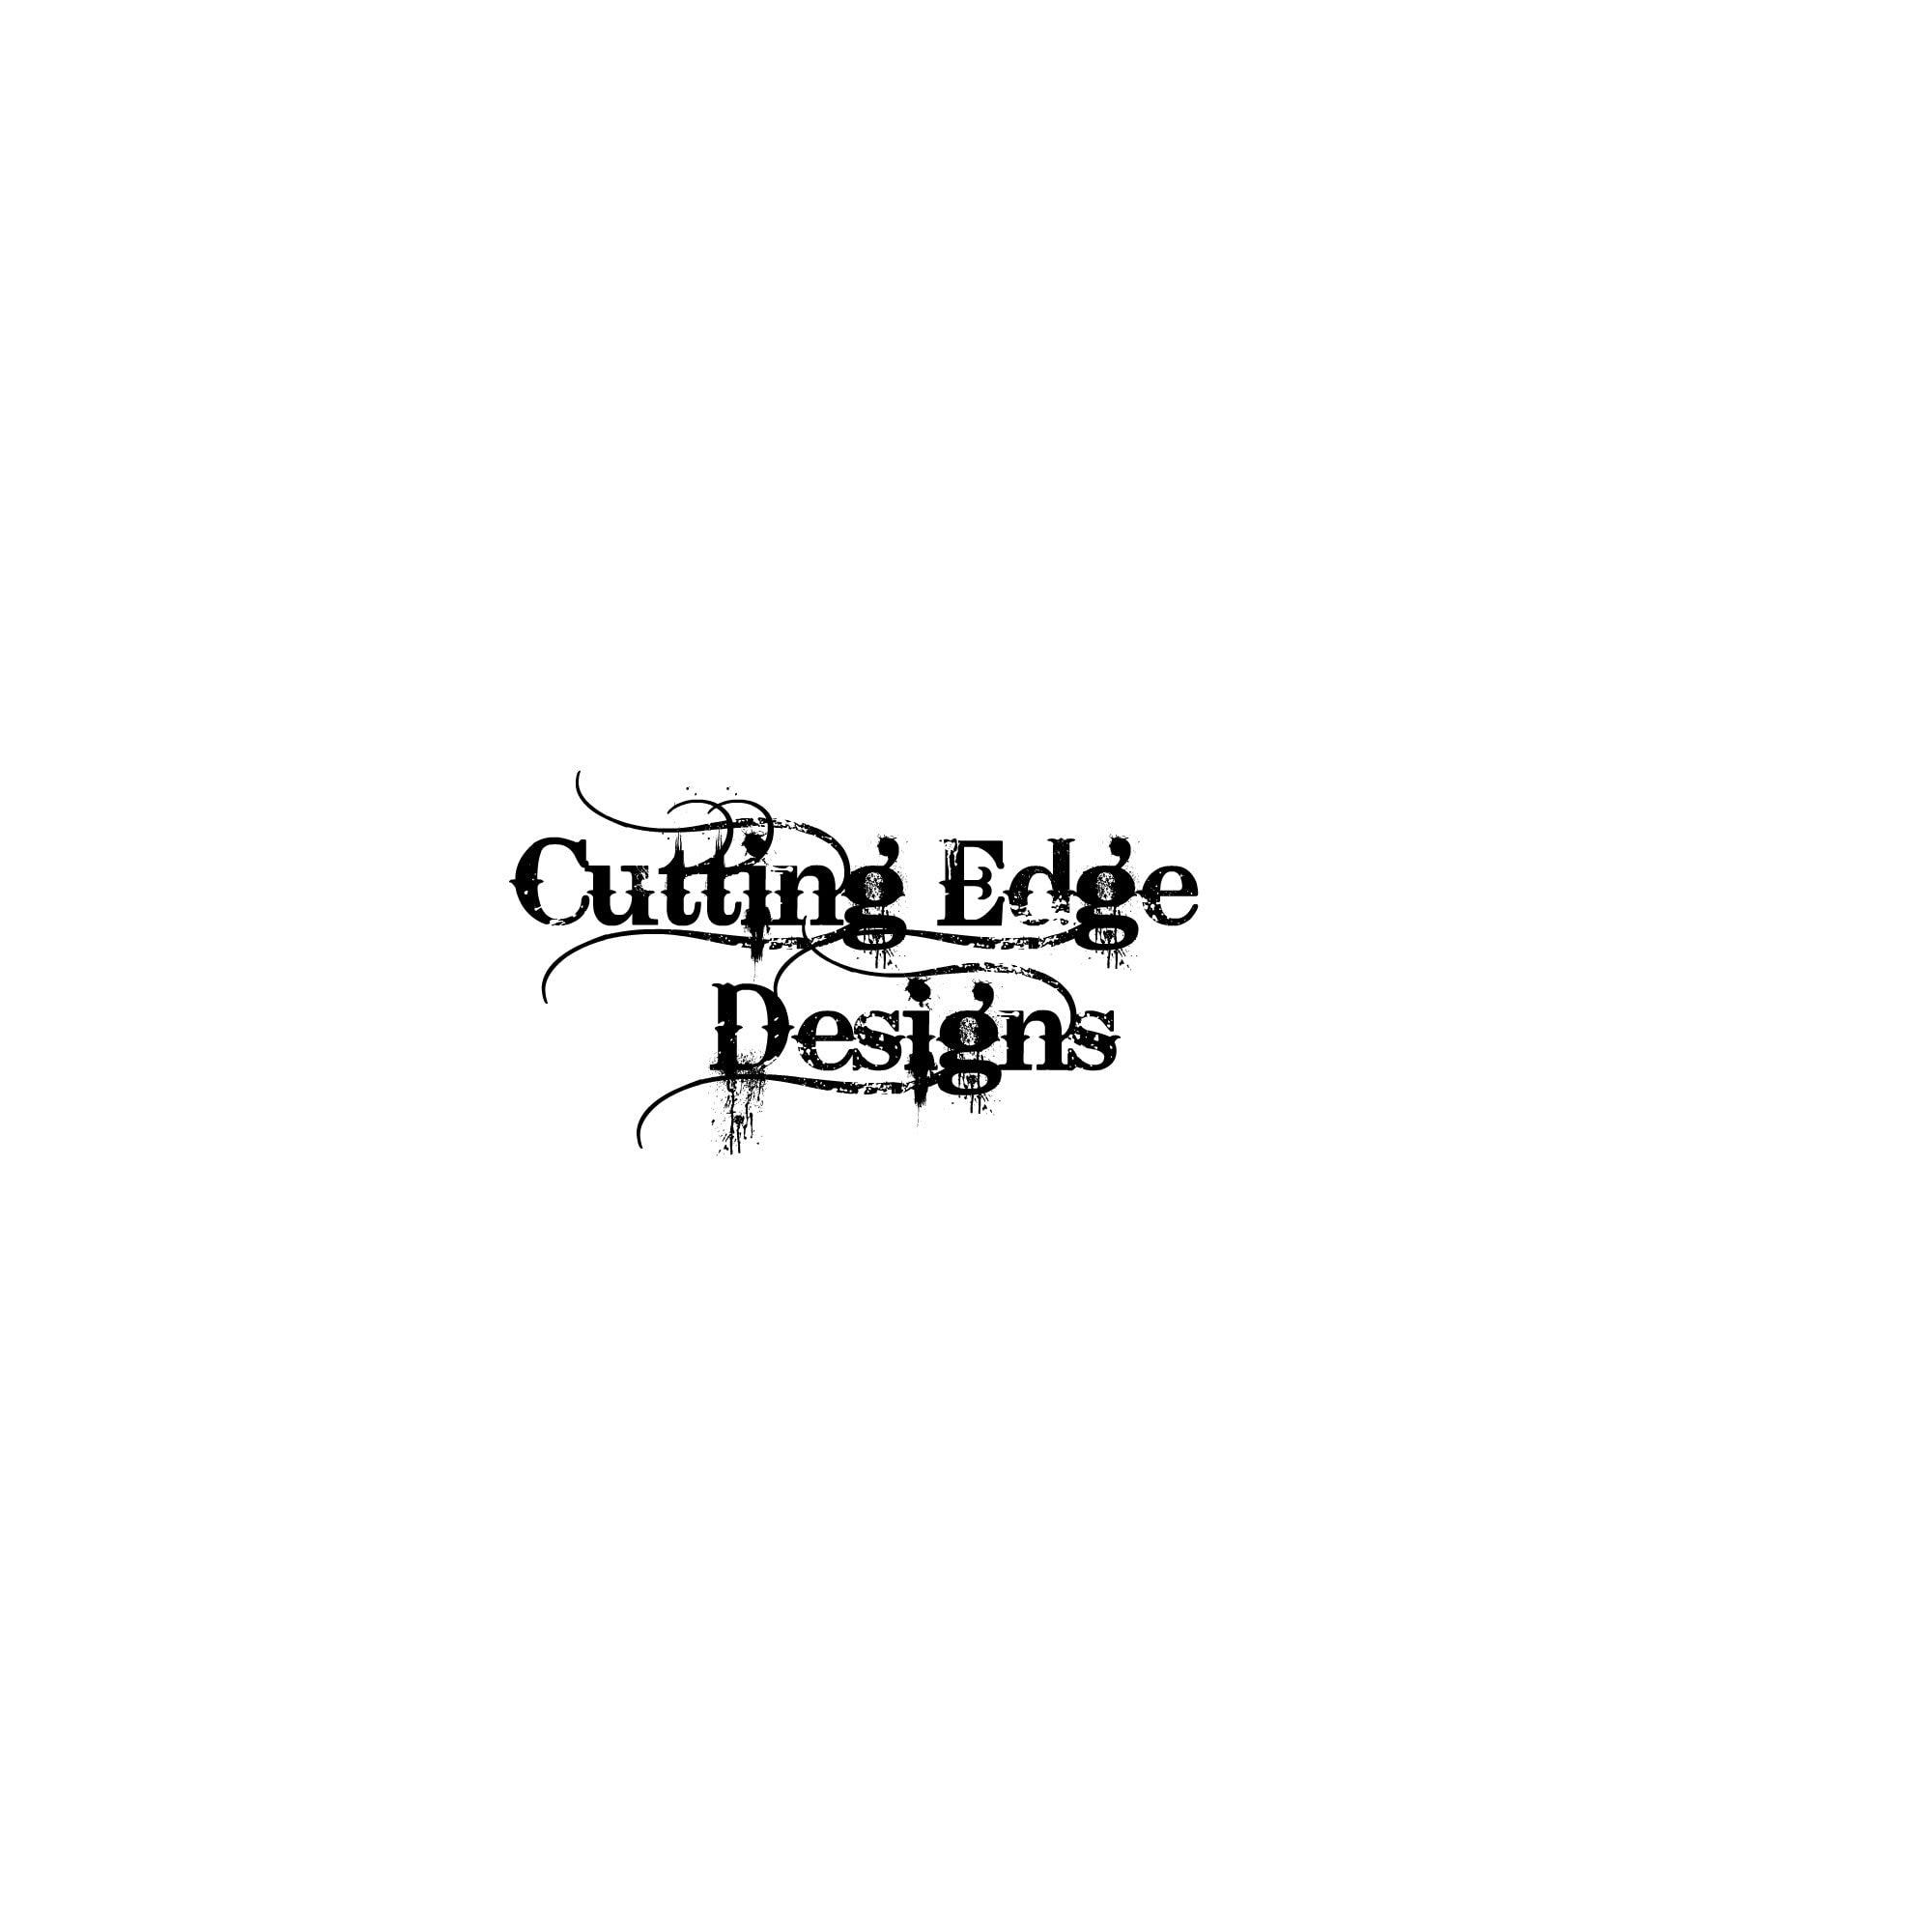 Cutting Edge Designs